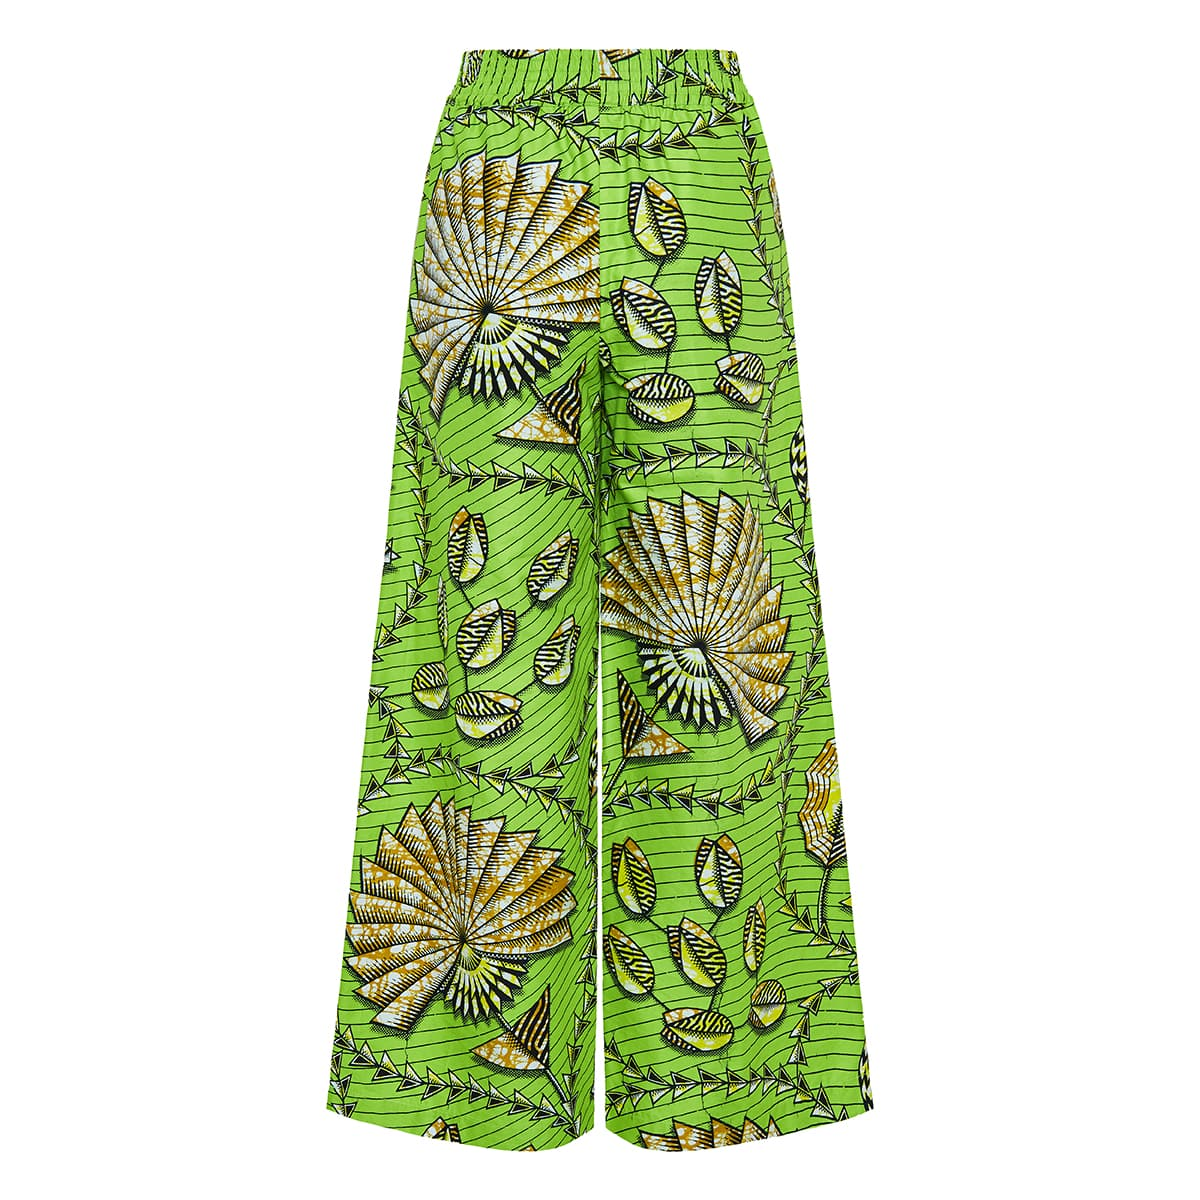 Kendima one-of-a-kind wide-leg trousers